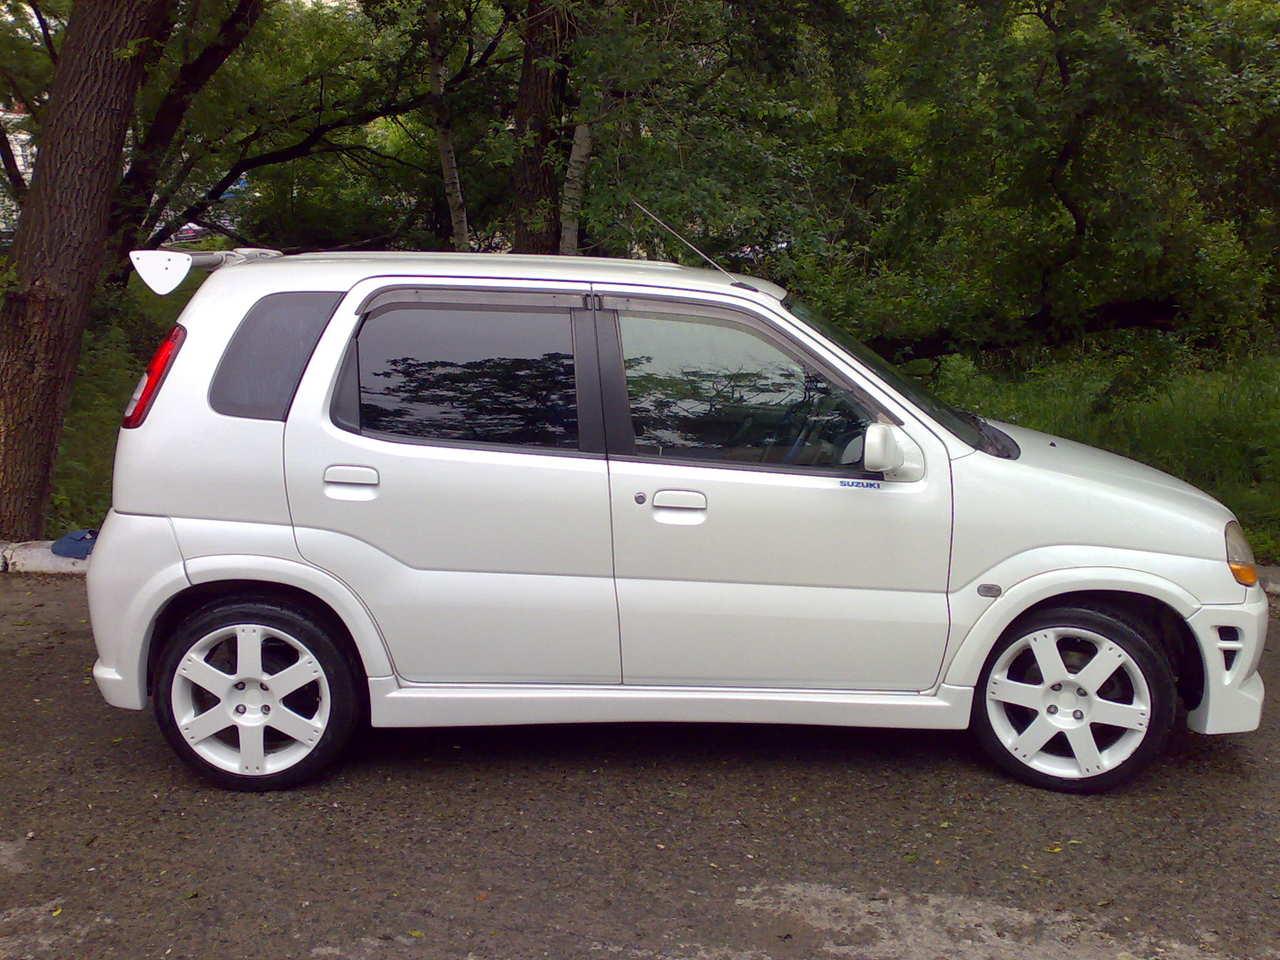 2001 suzuki swift photos 1 3 gasoline ff automatic for